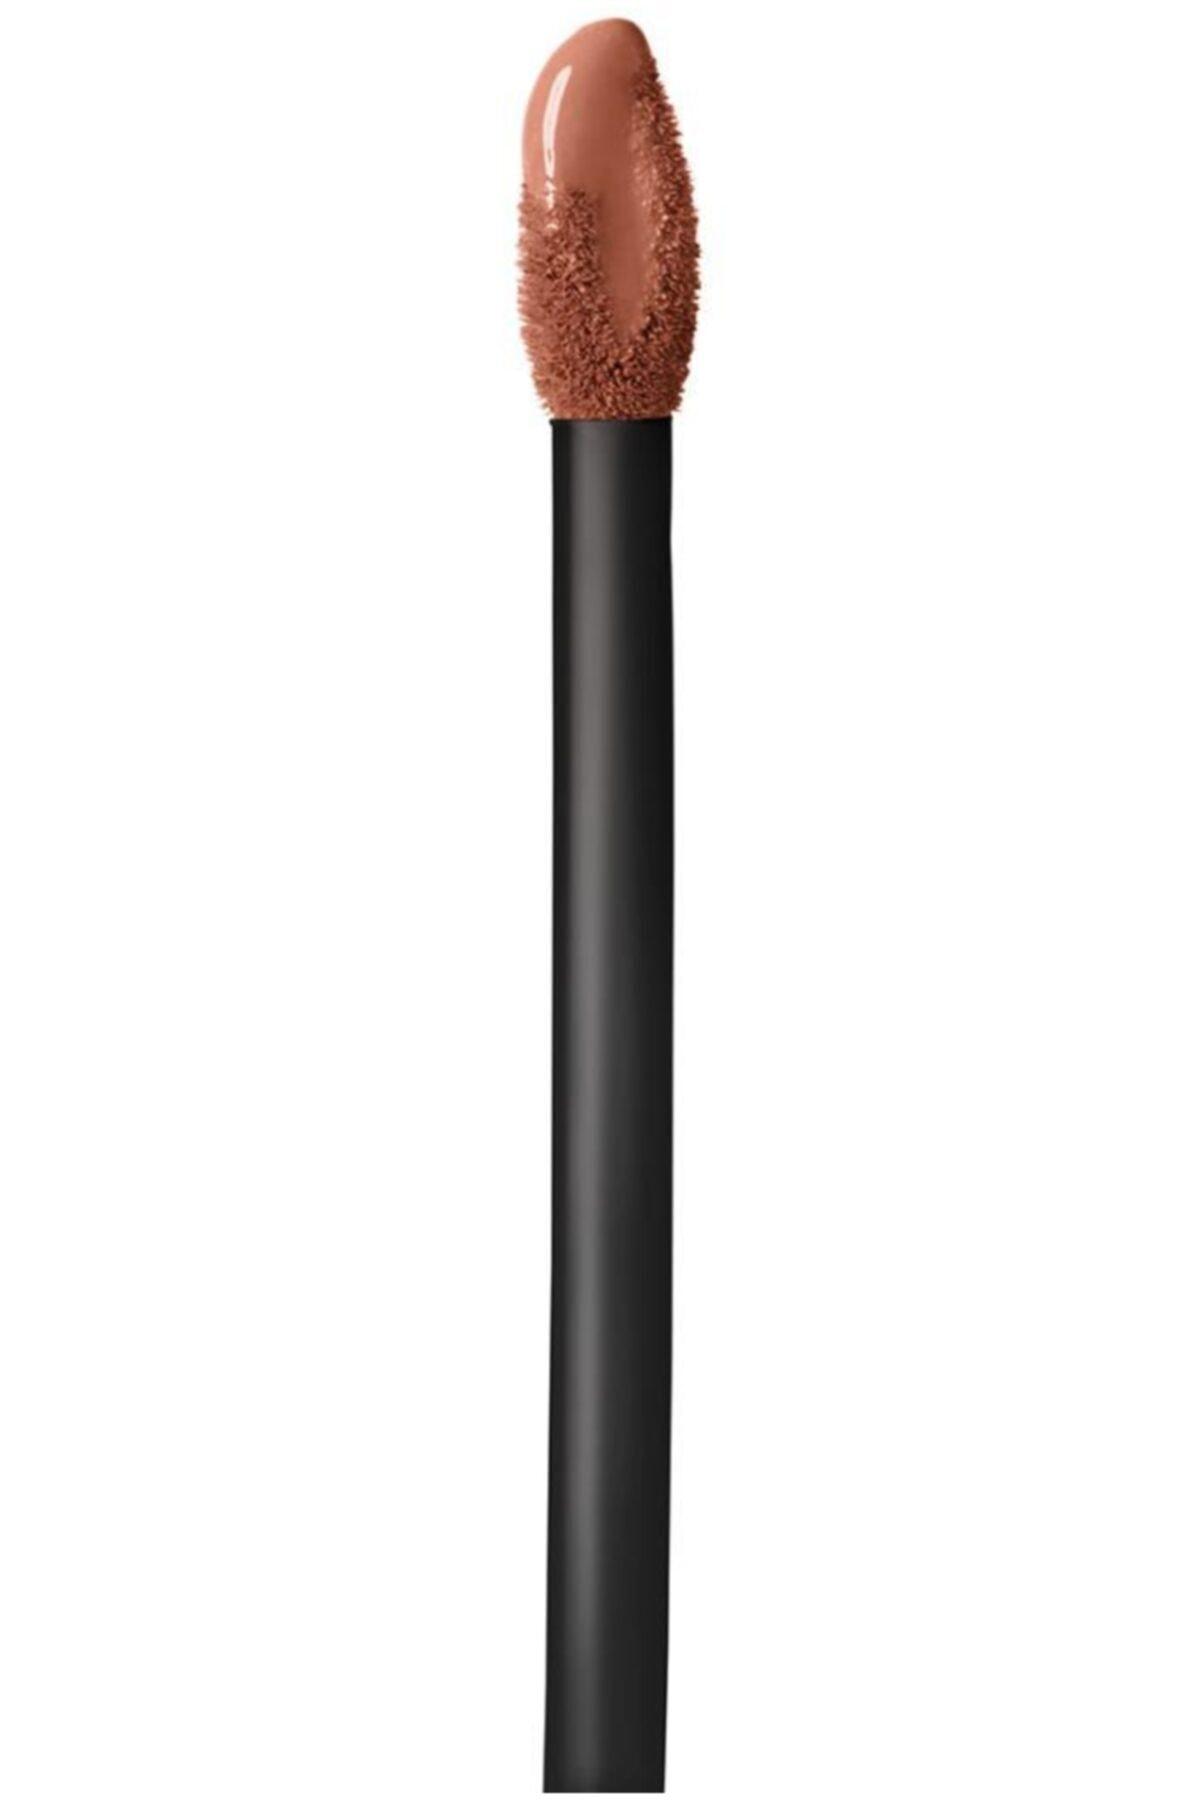 Maybelline New York Likit Mat Ruj - SuperStay Matte Ink Liquid Lipstick 75 Fighter 3600531469436 2